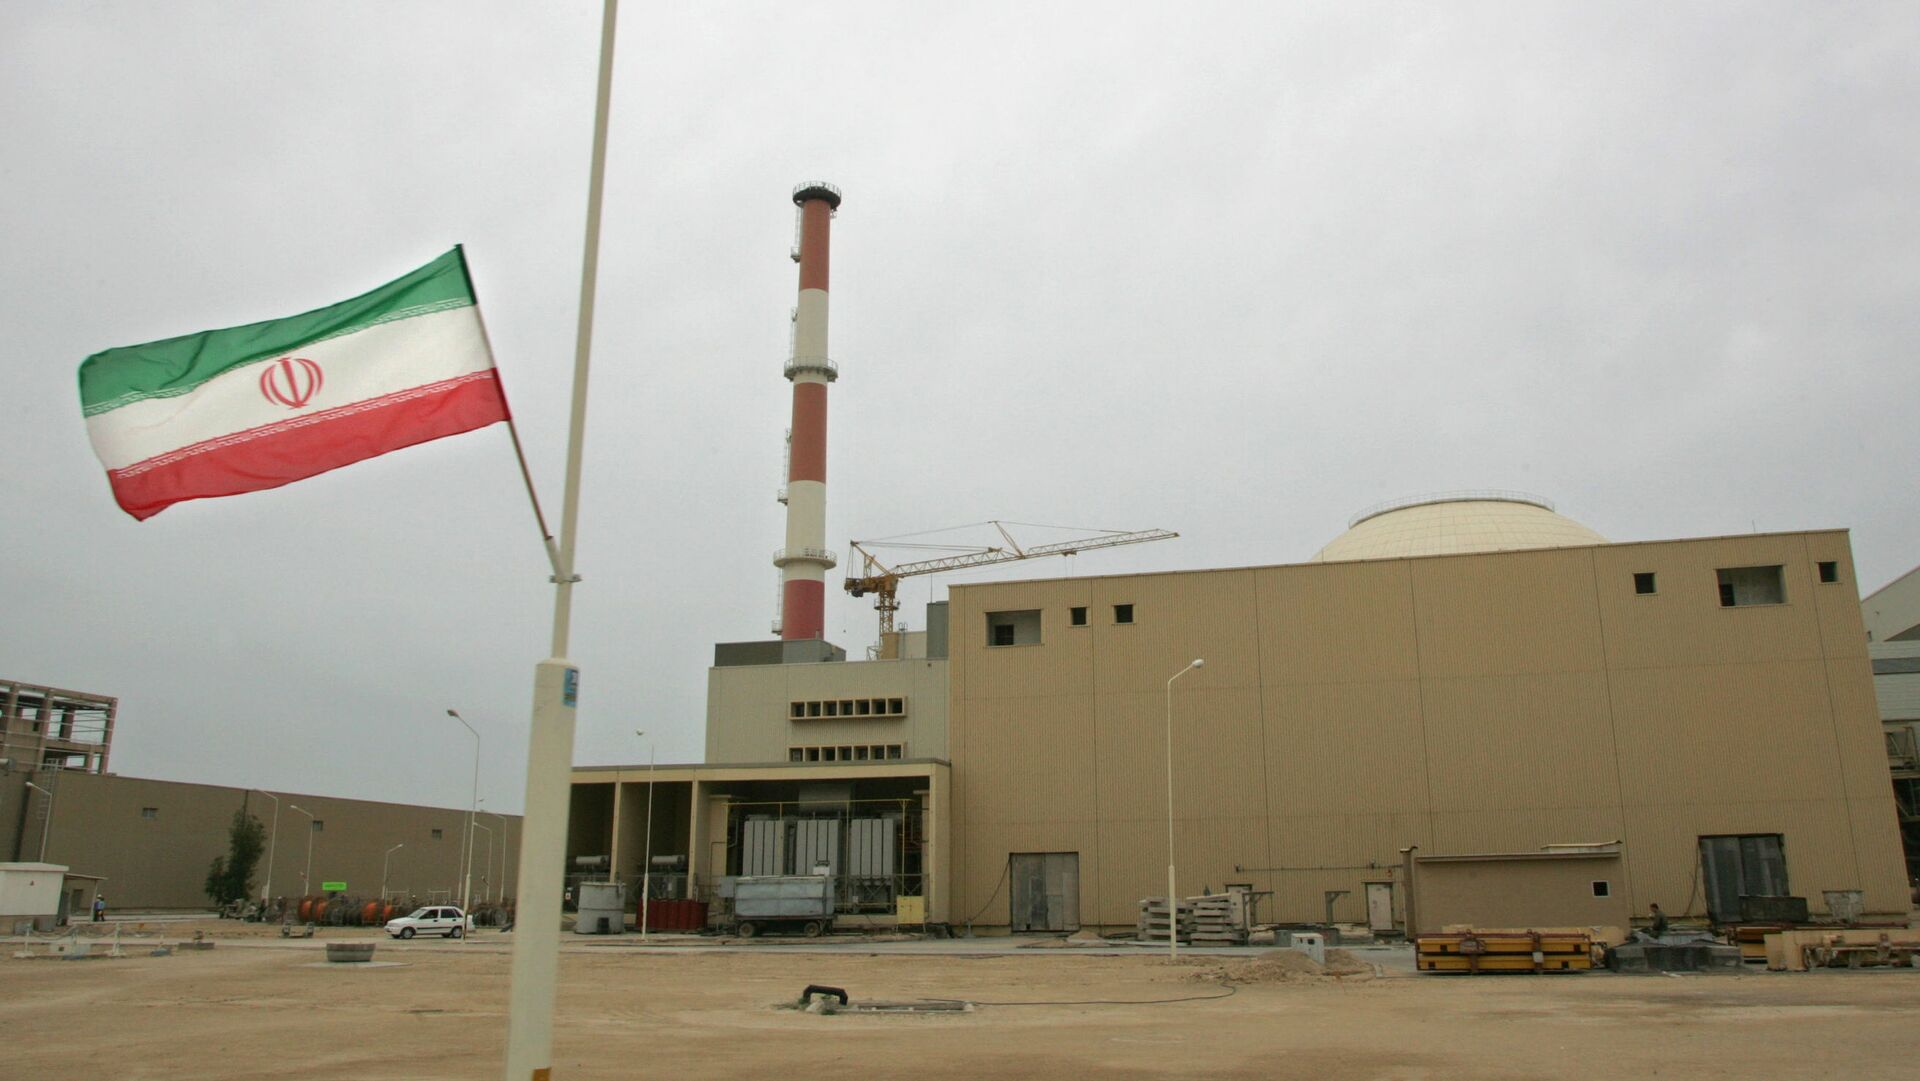 La bandera de Irán junto a la planta nuclear de Bushehr - Sputnik Mundo, 1920, 04.03.2021